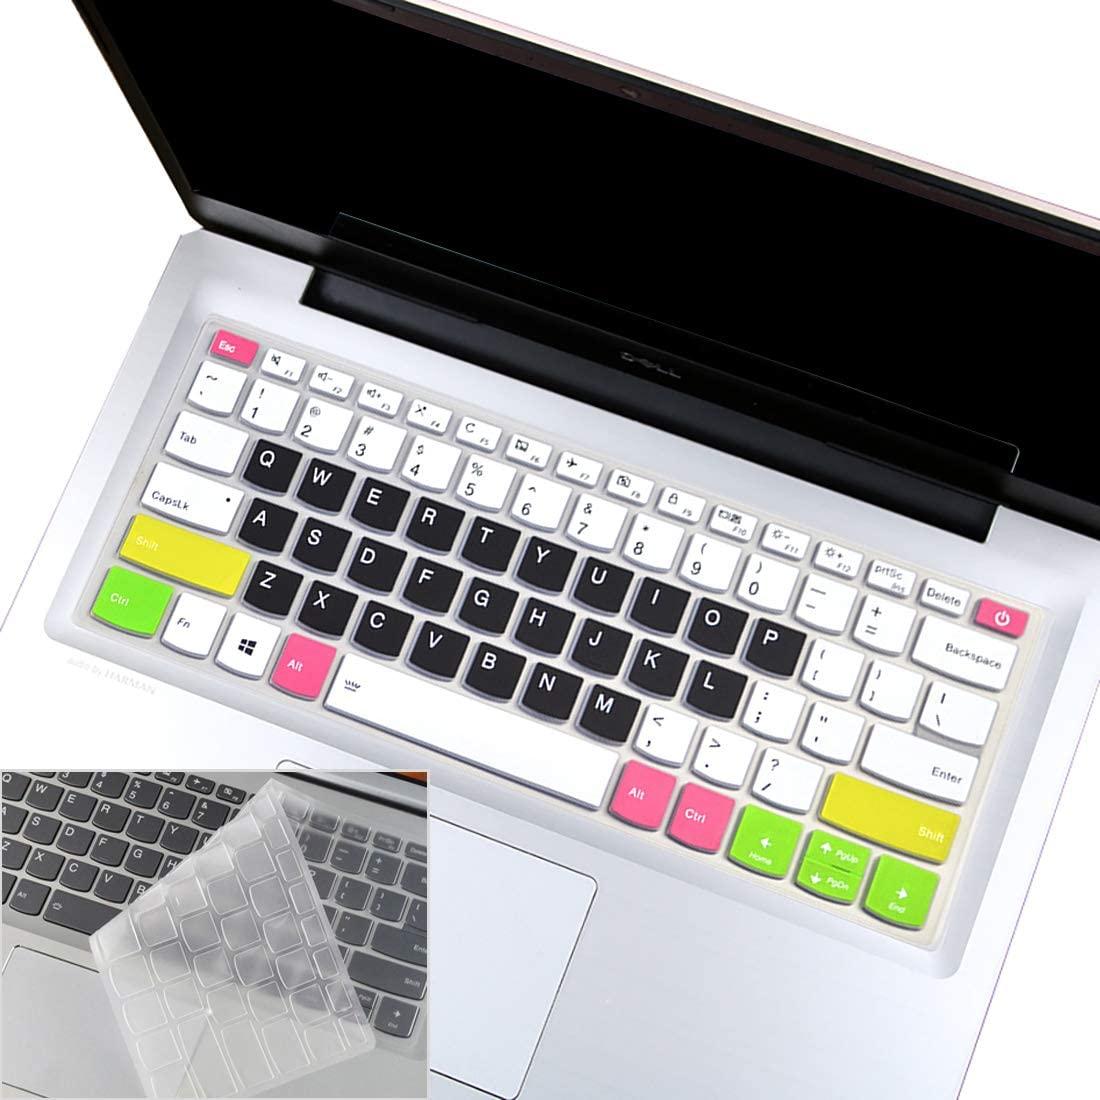 2Pcs Keyboard Cover Skin for Lenovo Yoga C930 930 920 13.9